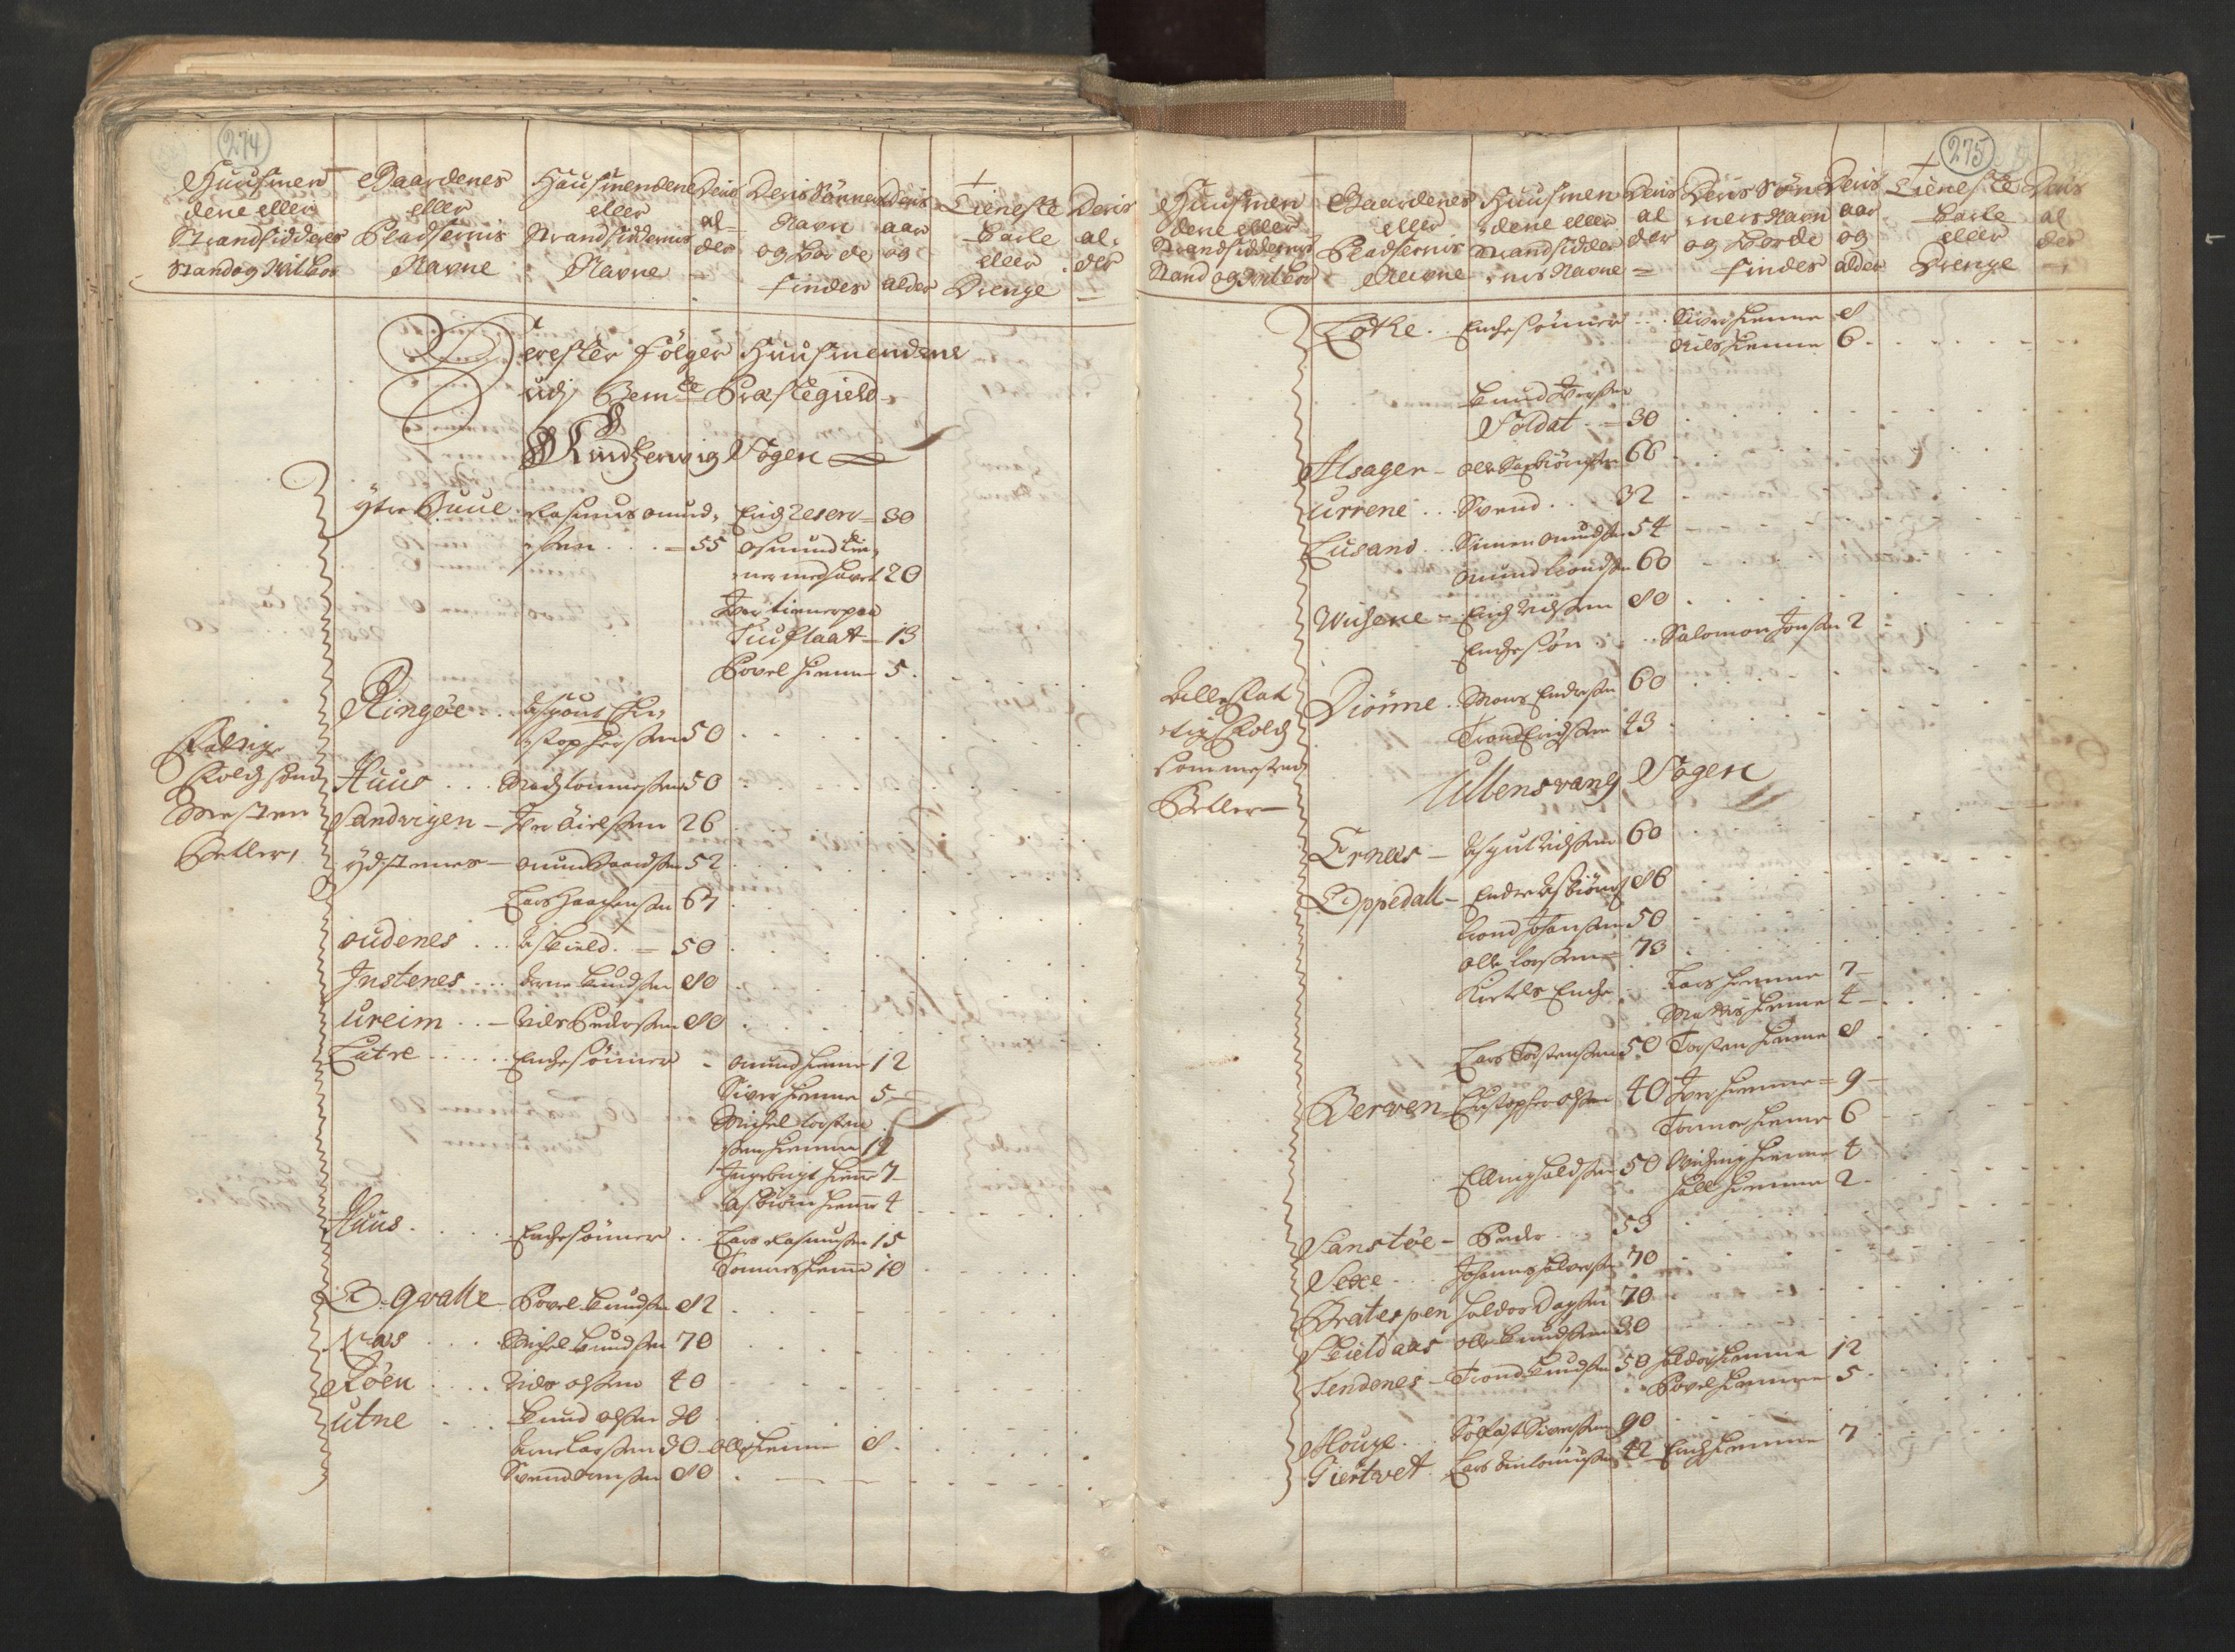 RA, Manntallet 1701, nr. 6: Sunnhordland fogderi og Hardanger fogderi, 1701, s. 274-275